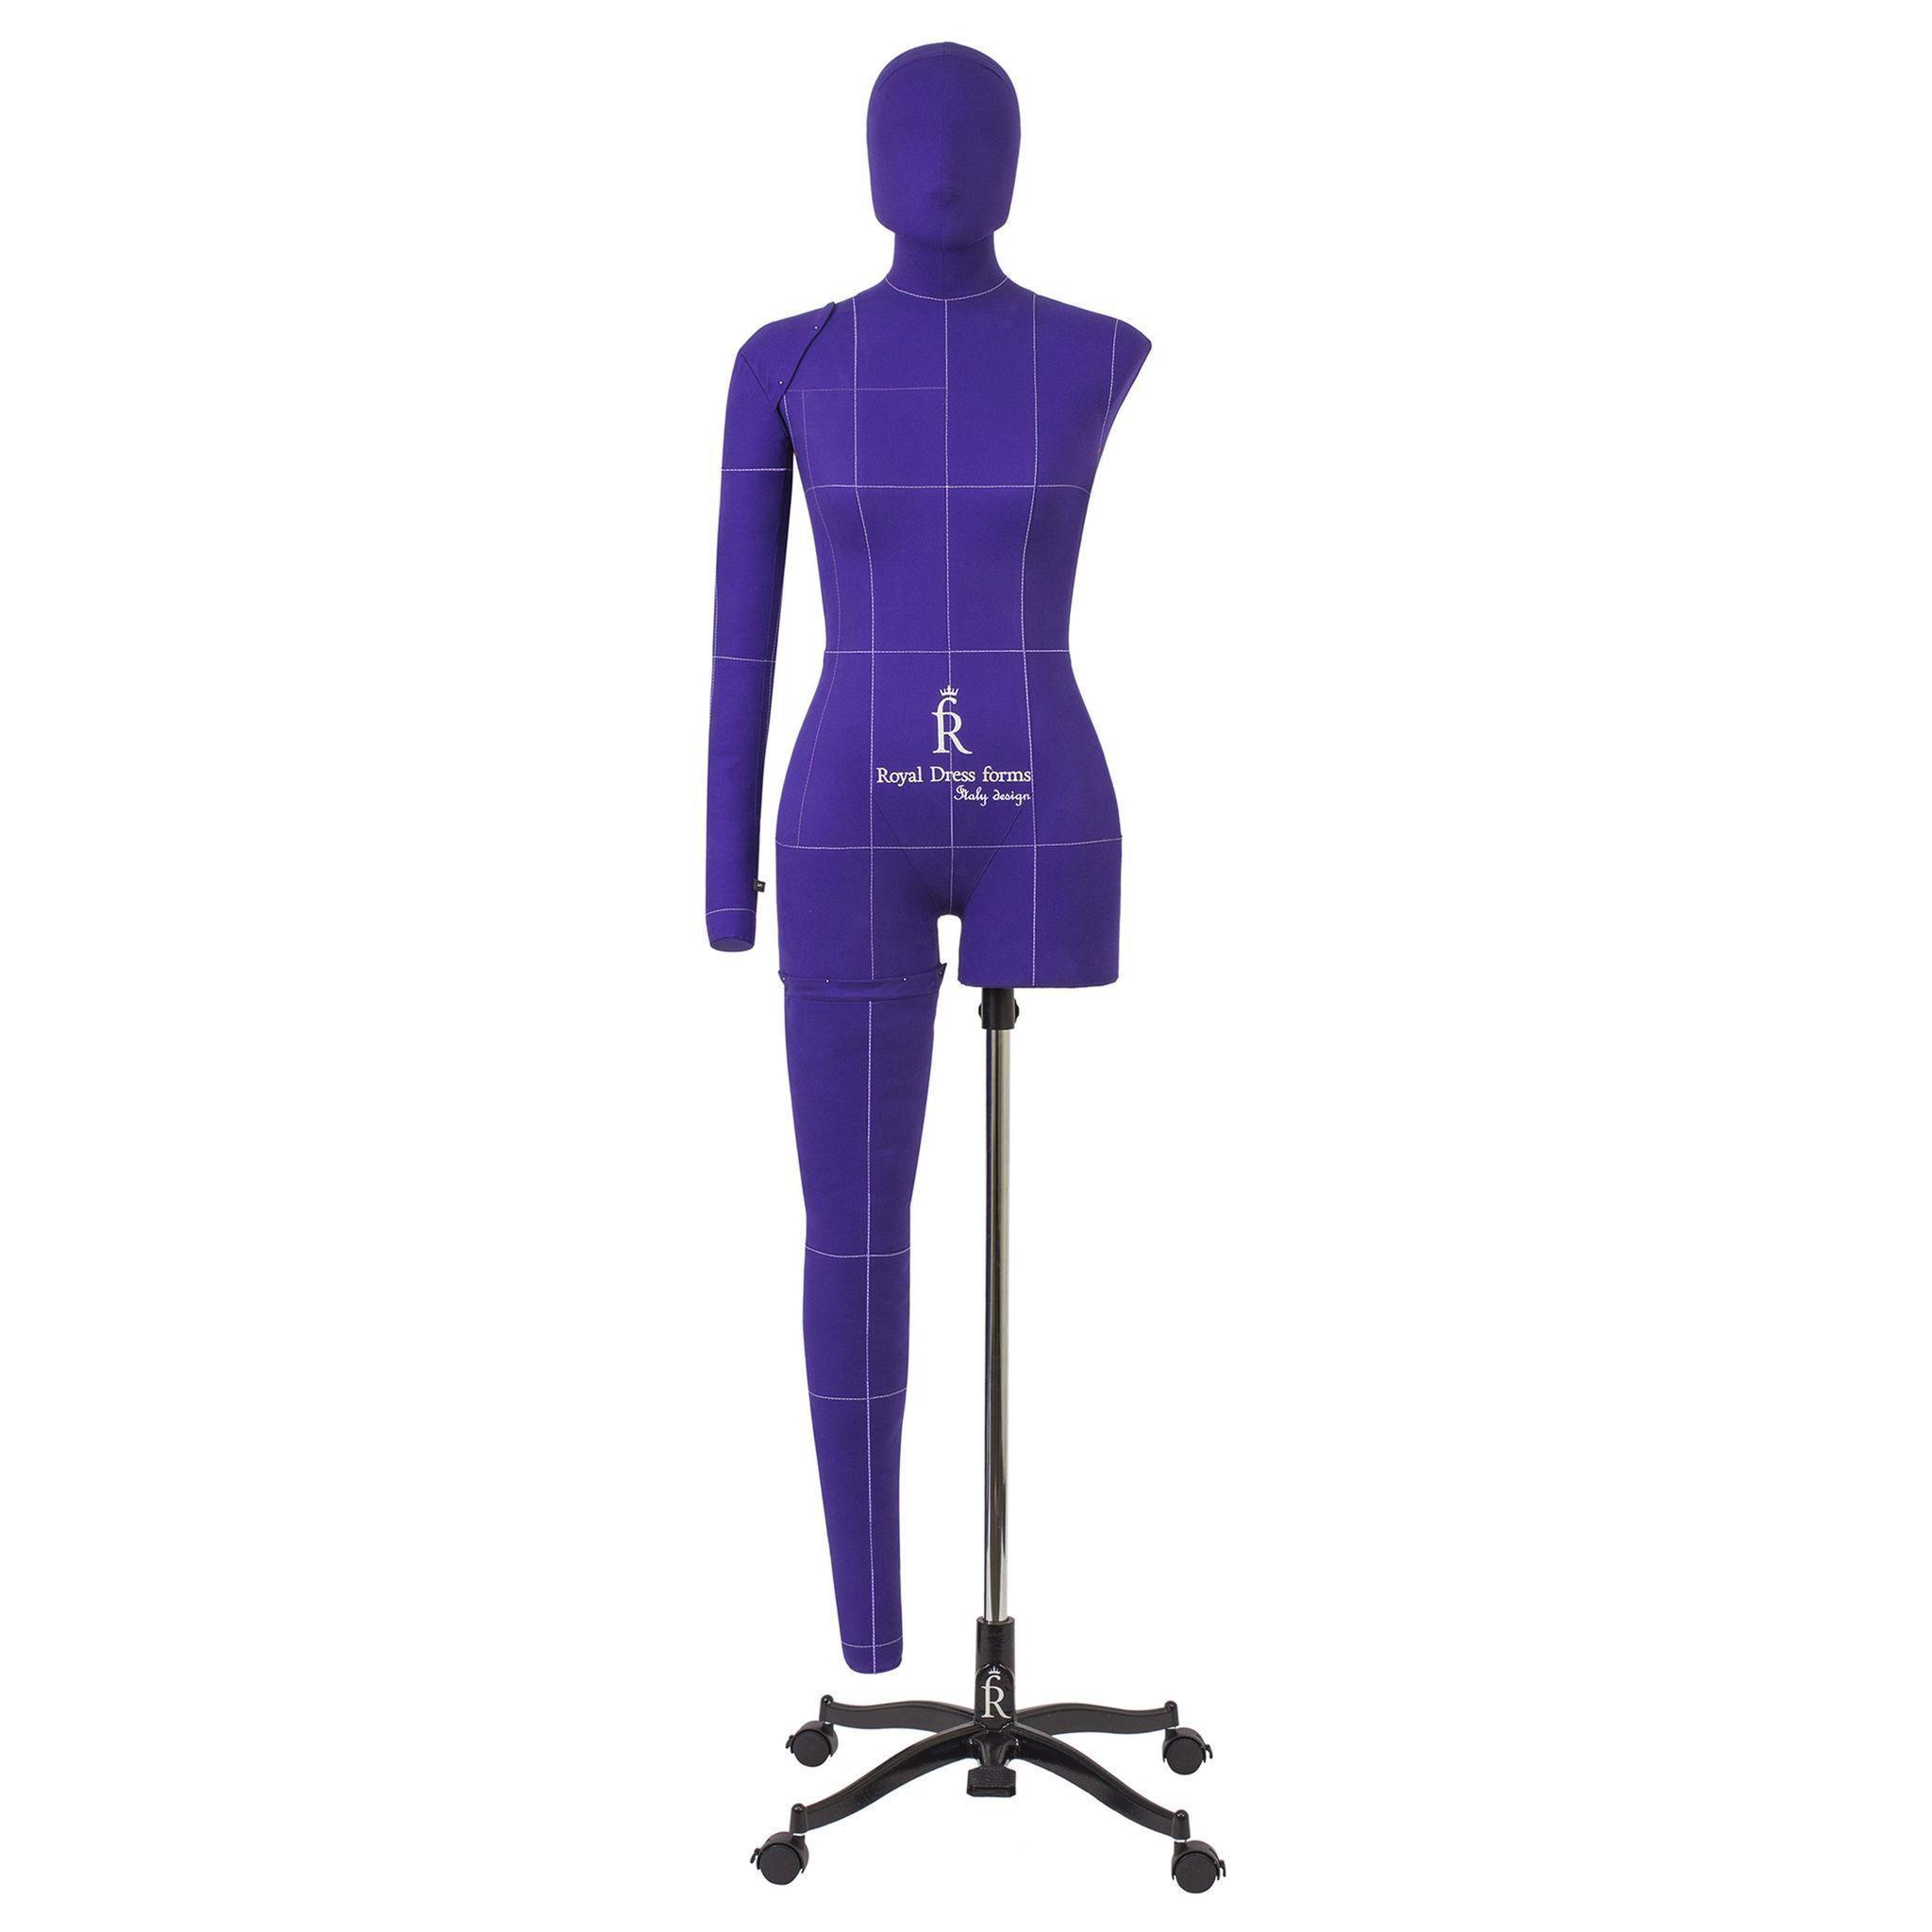 Манекен портновский Моника, комплект Арт, размер 52, ФиолетовыйФото 3